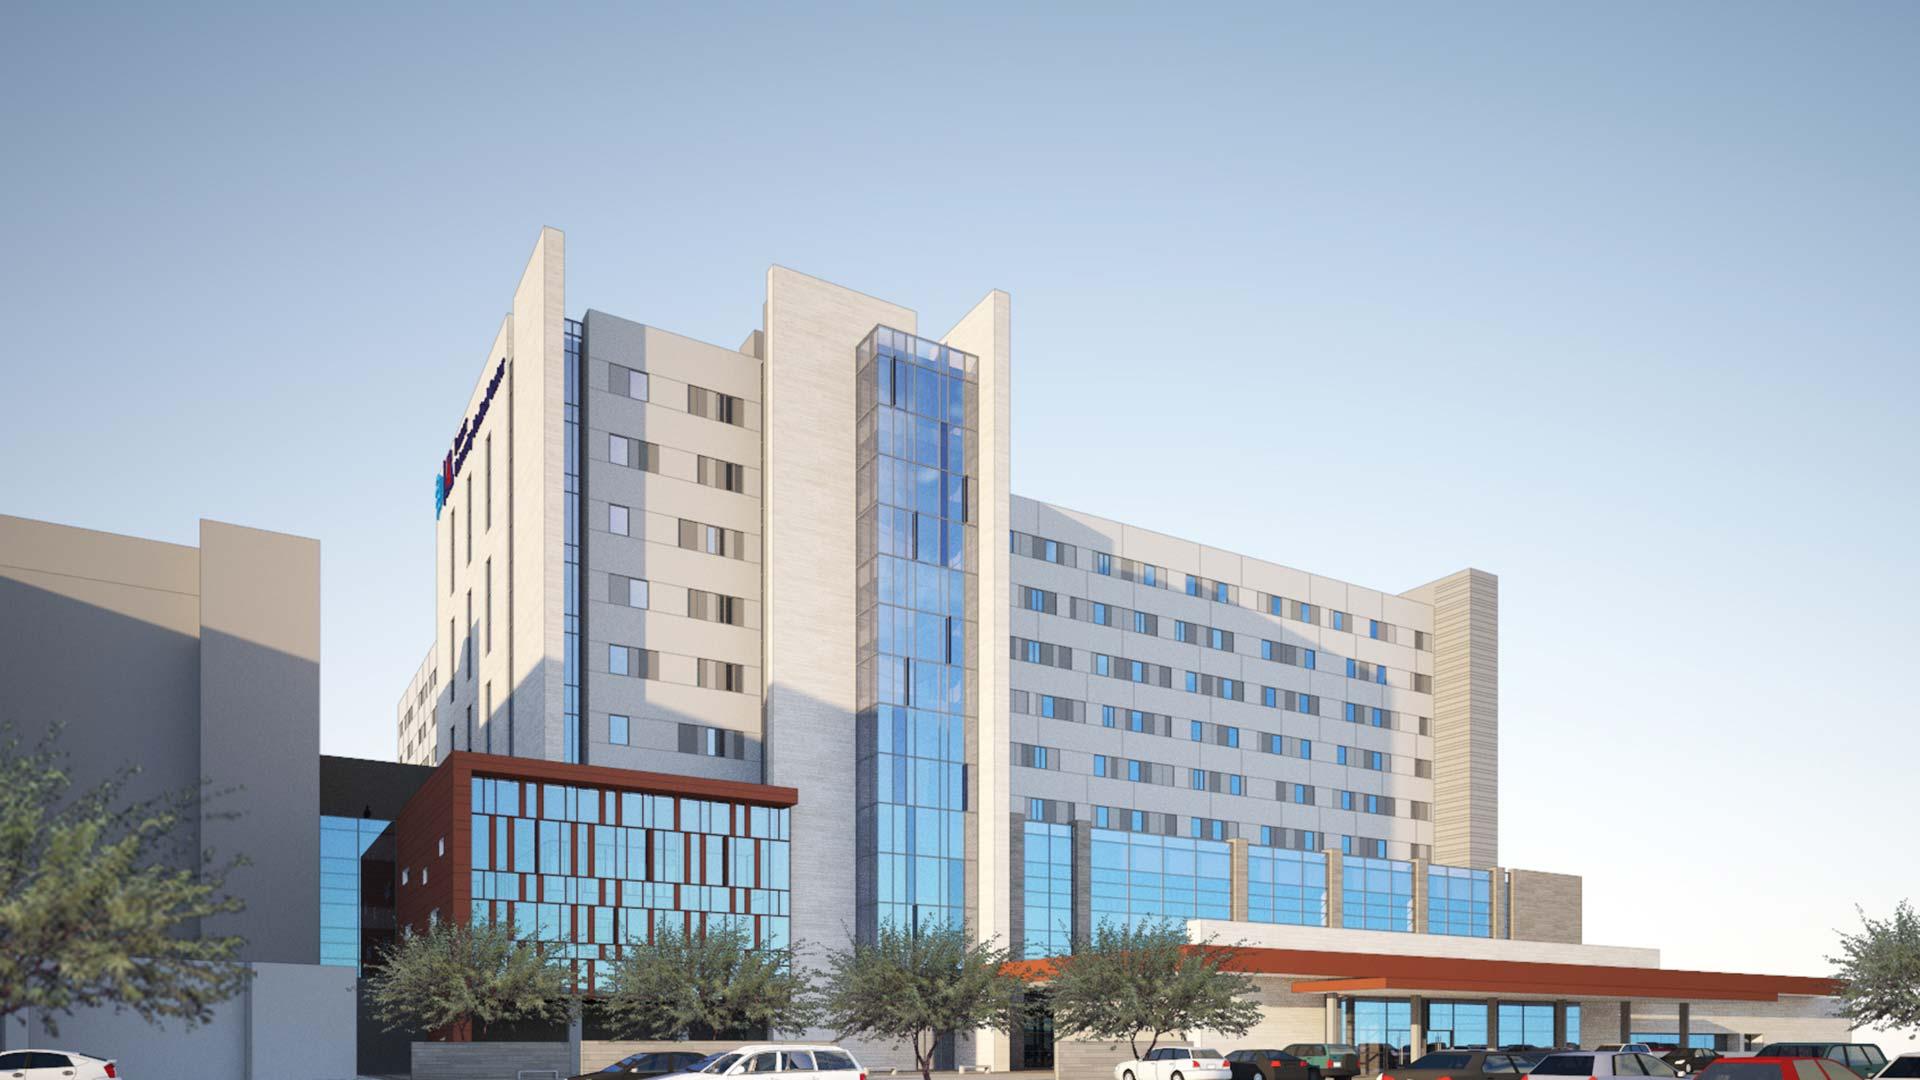 Ground Broken for New University Hospital Tower - AZPM